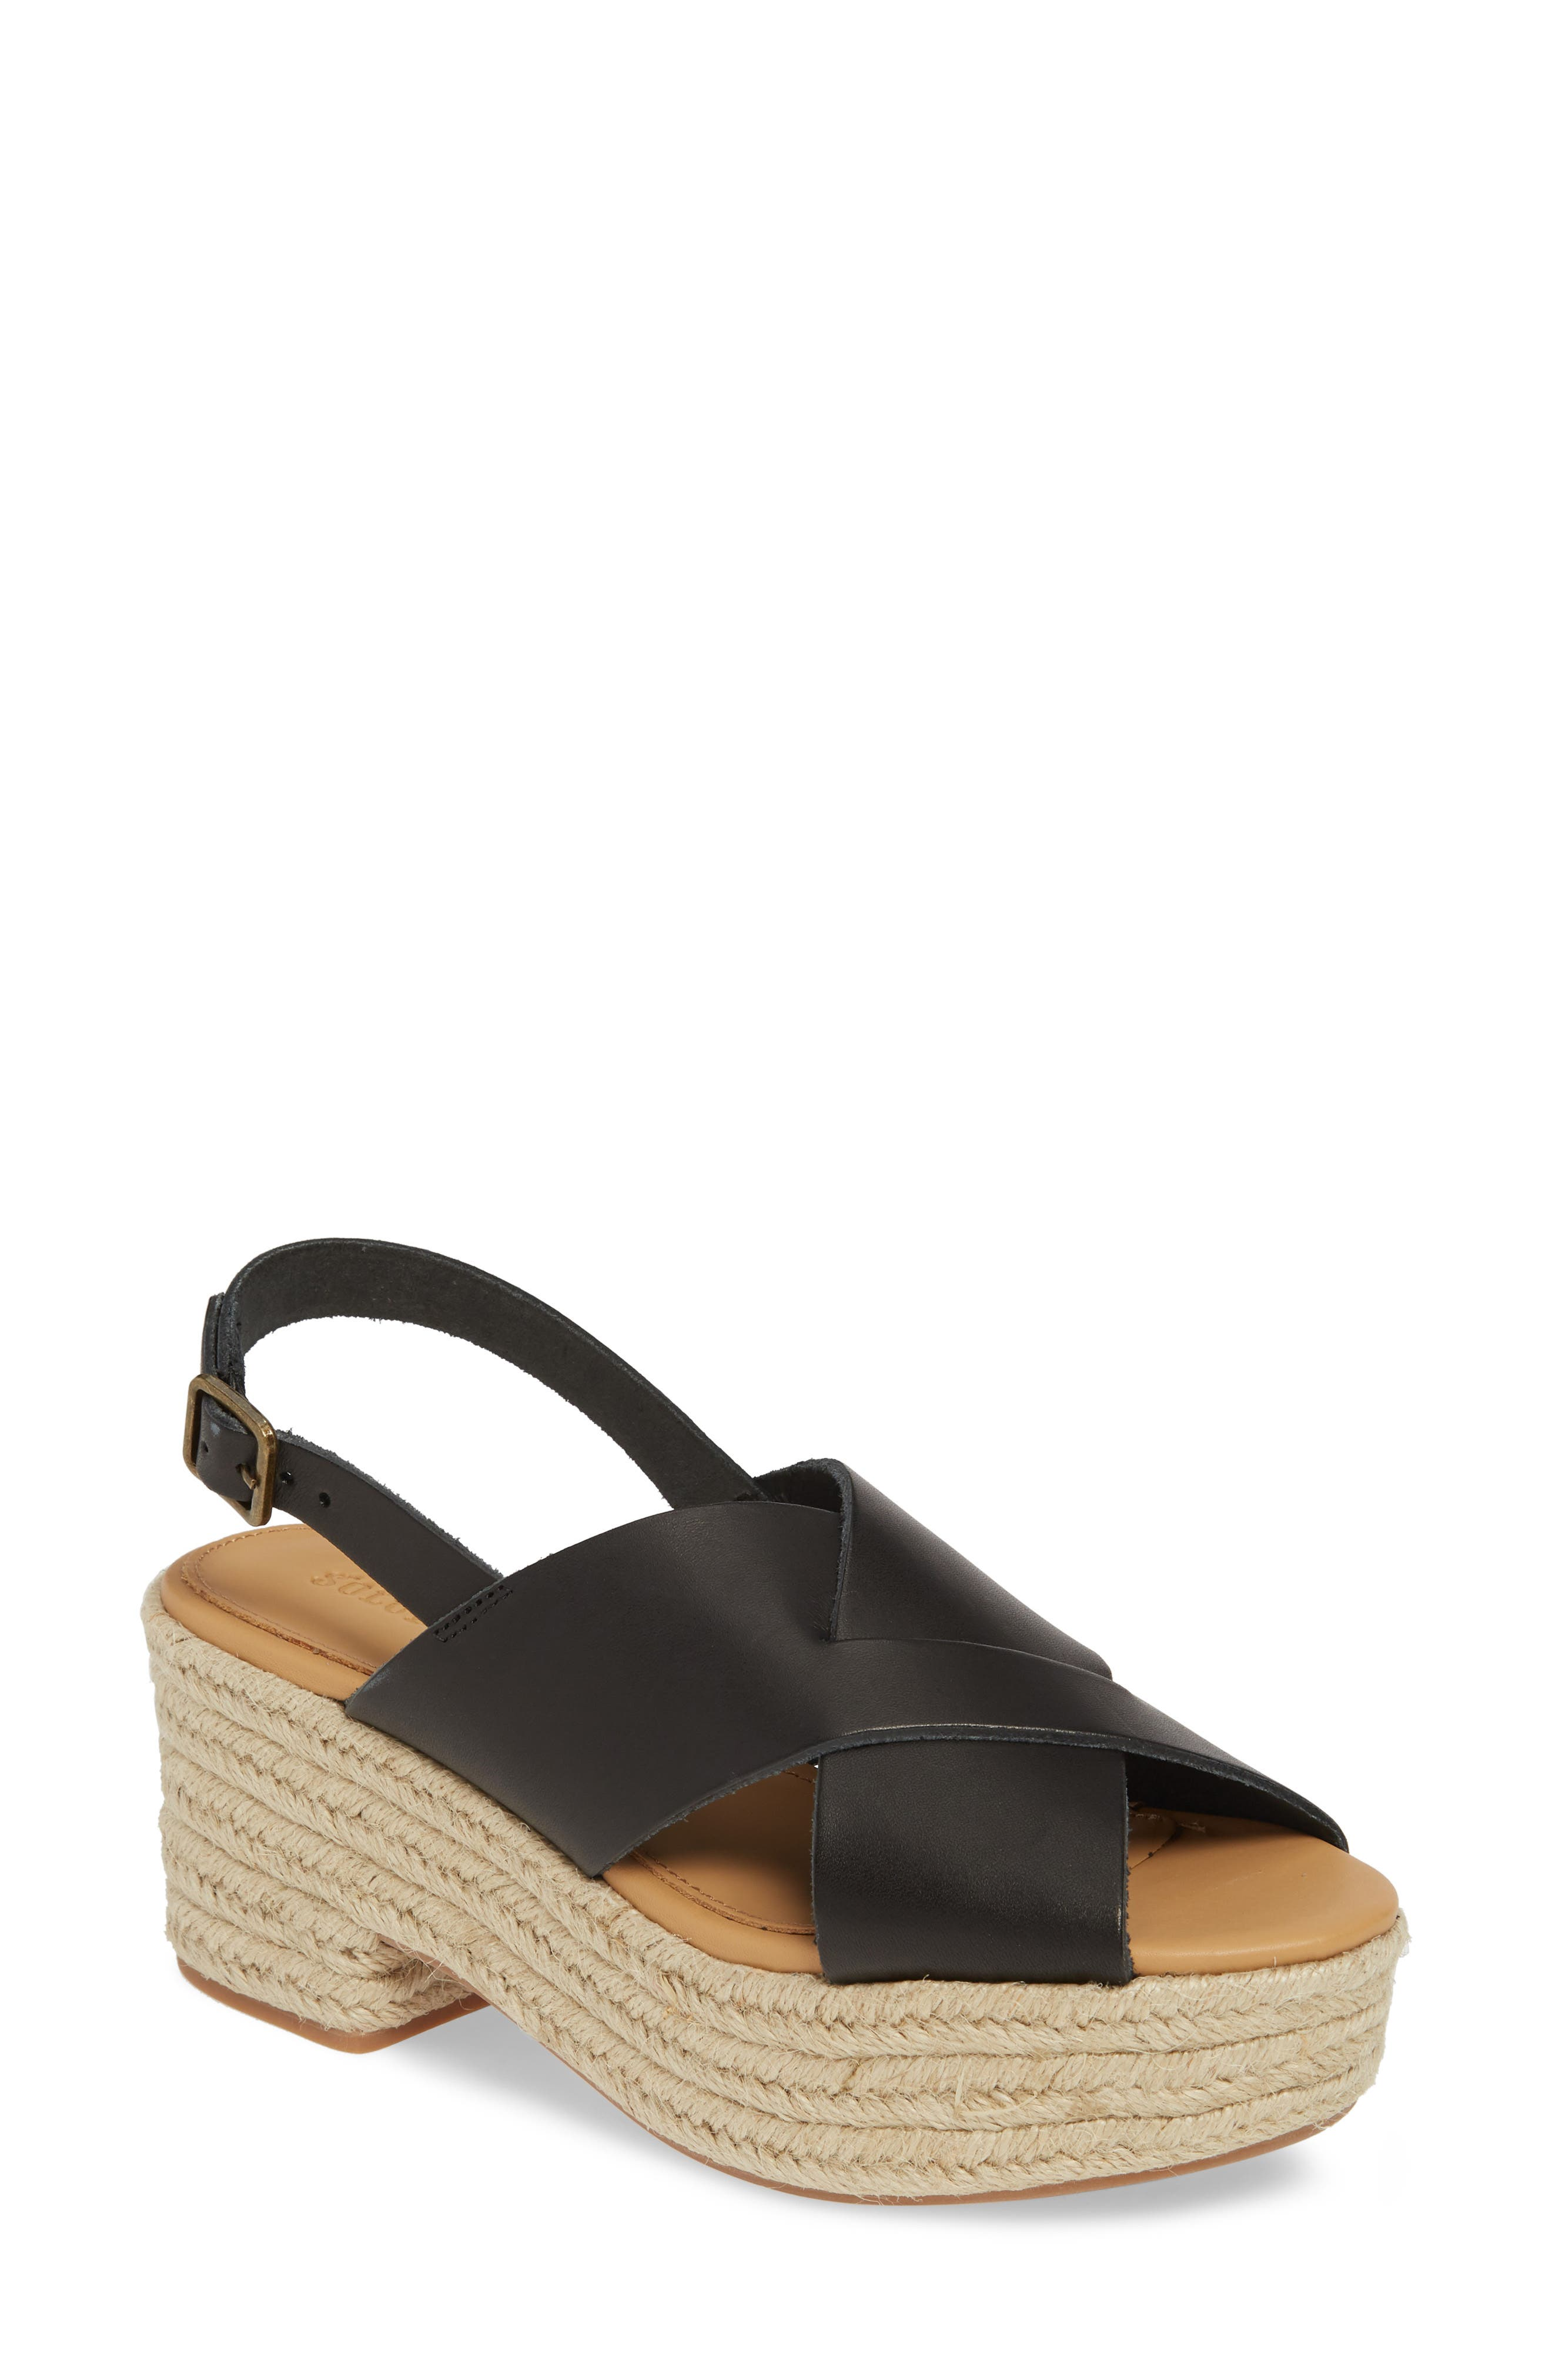 Soludos Amalfi Platform Espadrille Sandal, Black